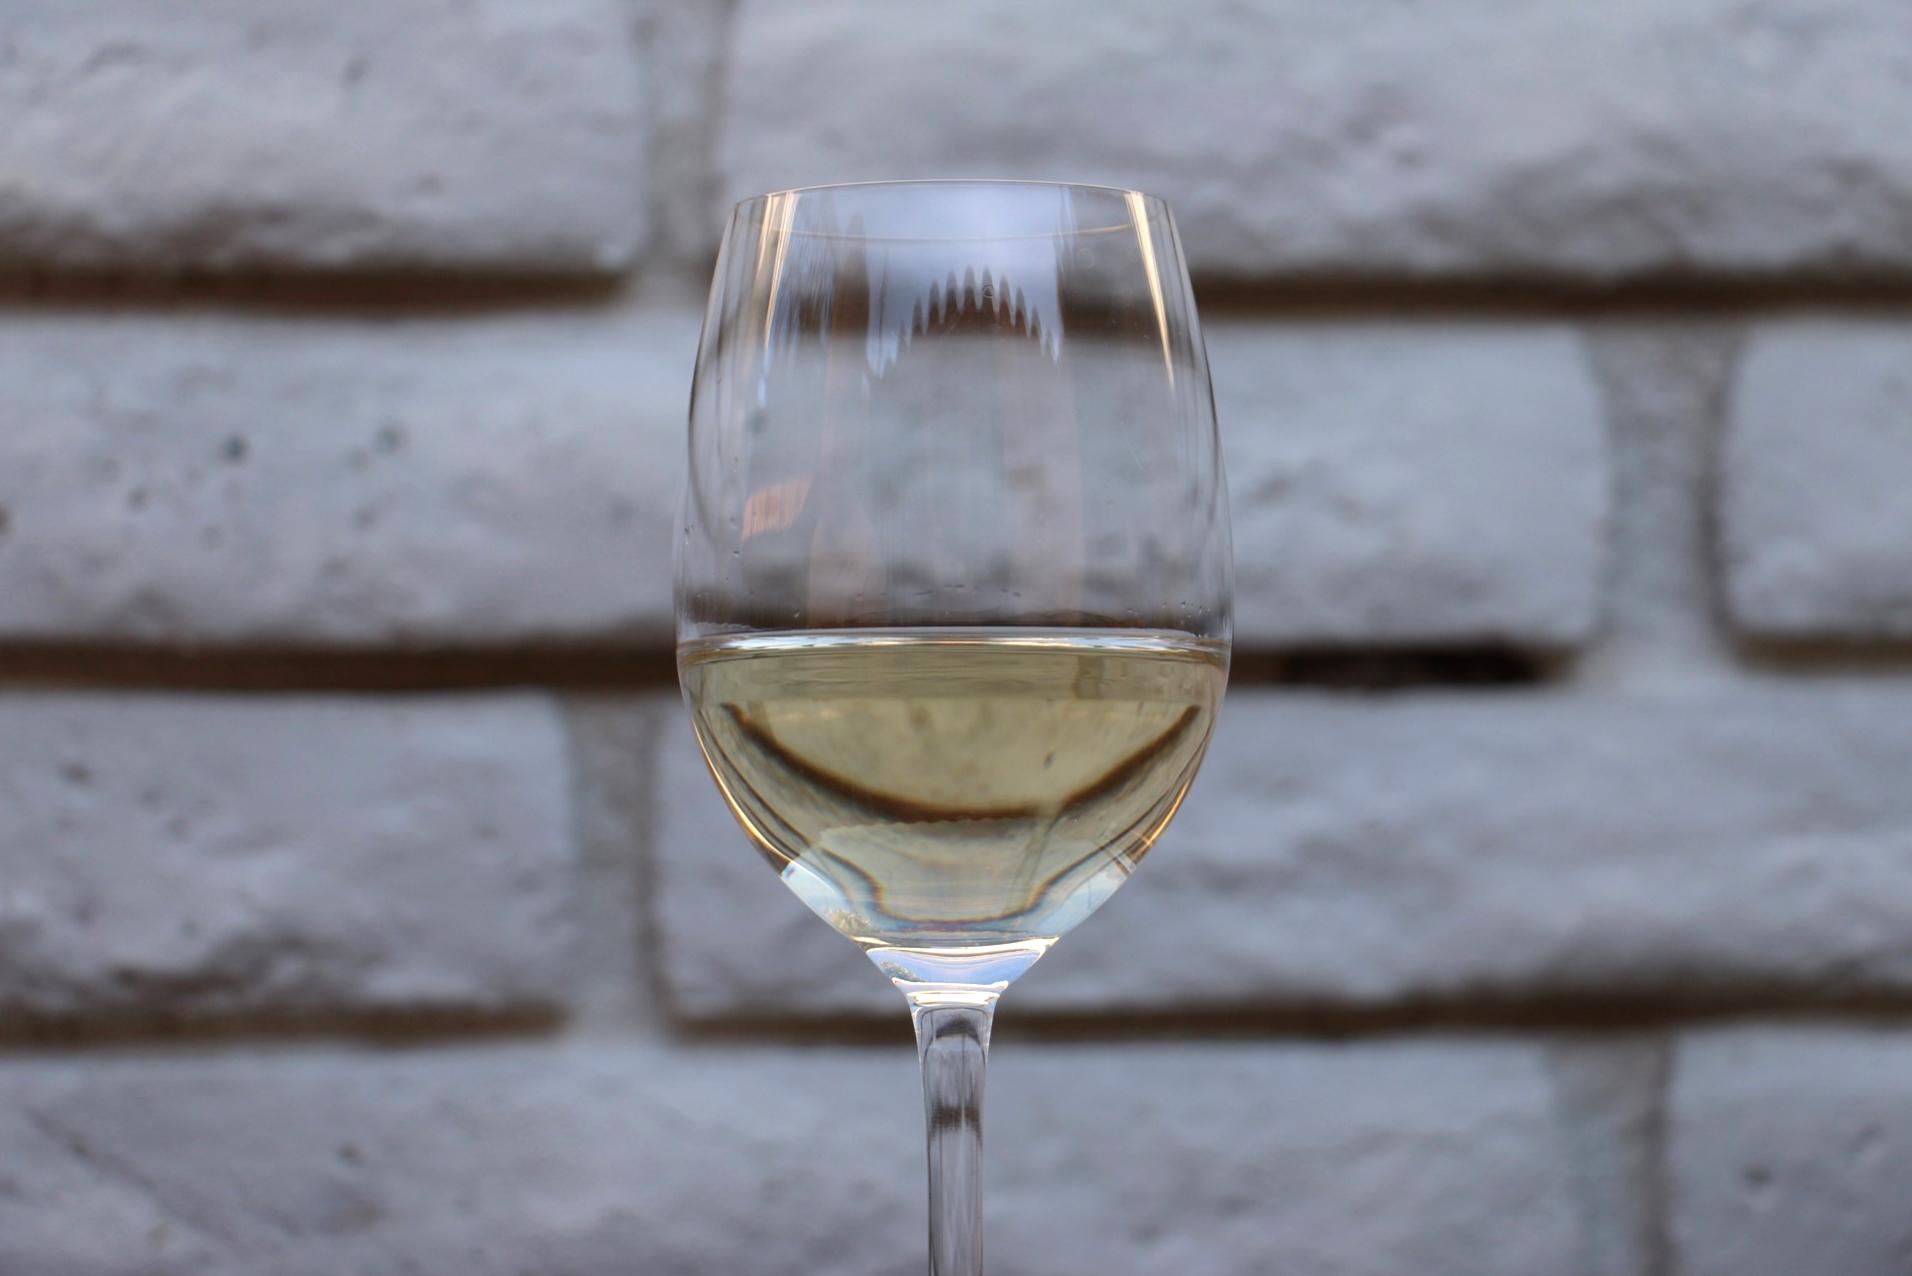 trader joe's block 67 sauvignon blanc boxed wine review